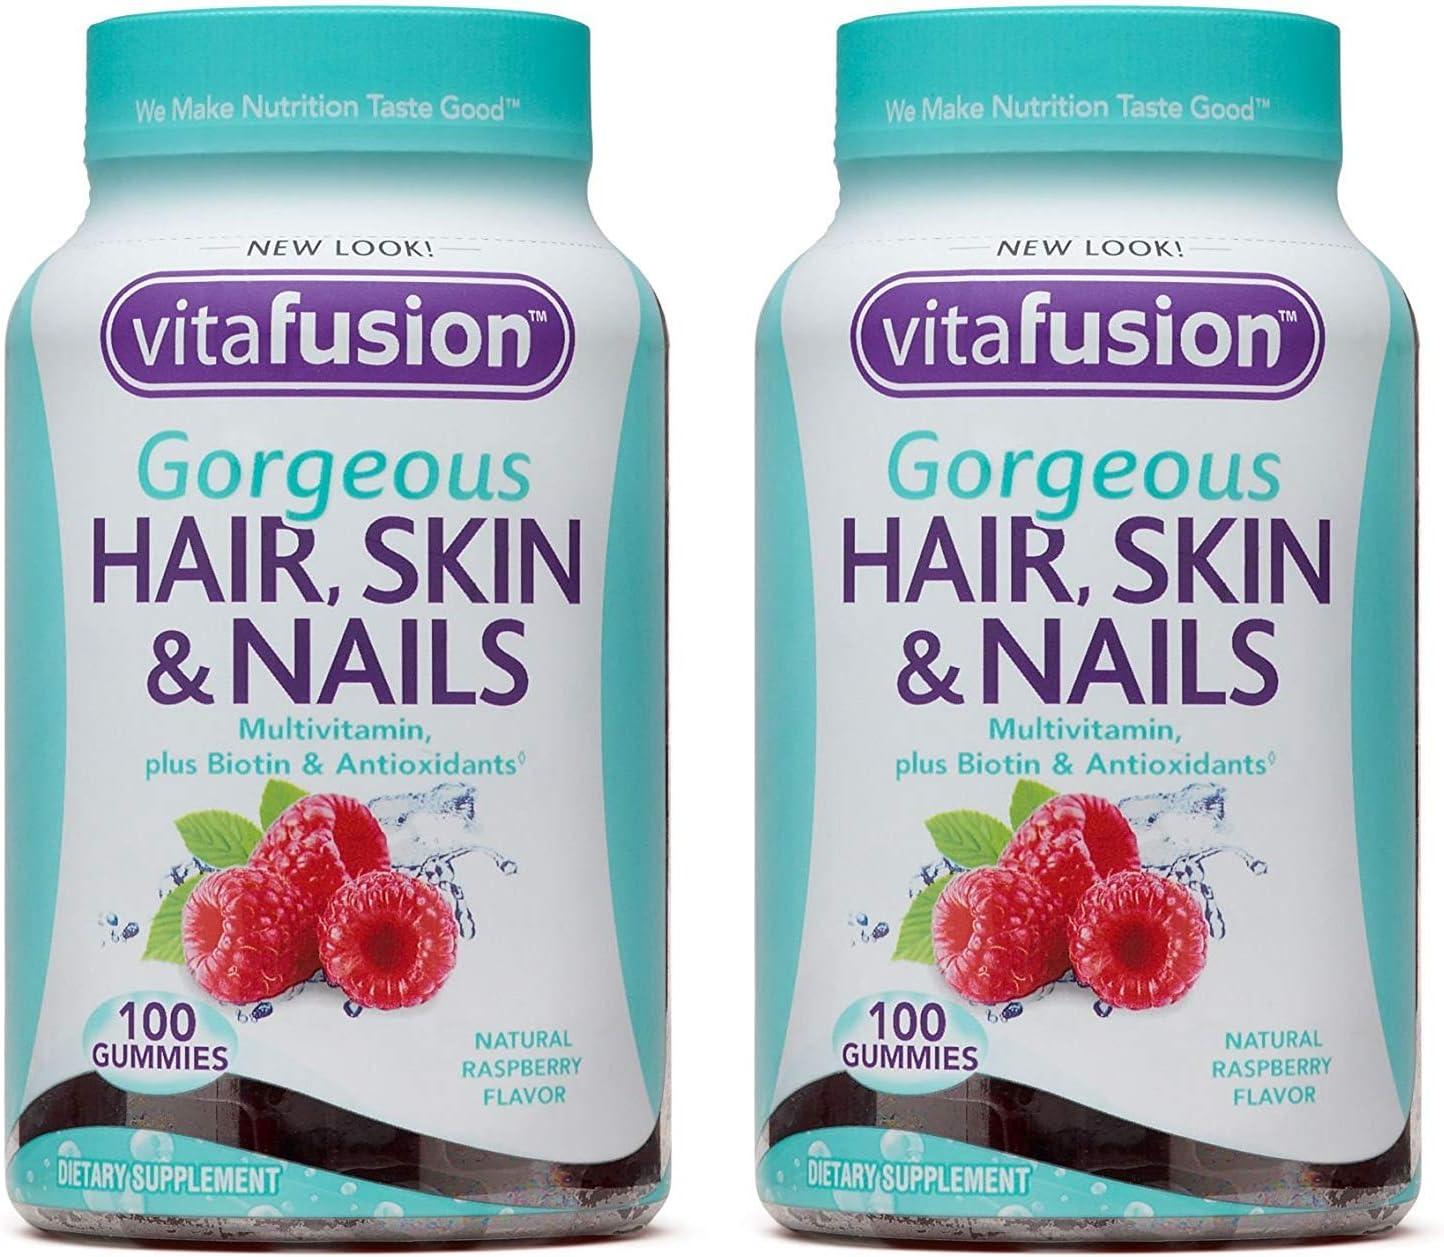 Vitafusion Gorgeous Hair, Skin & Nails Multivitamin, 12 Count